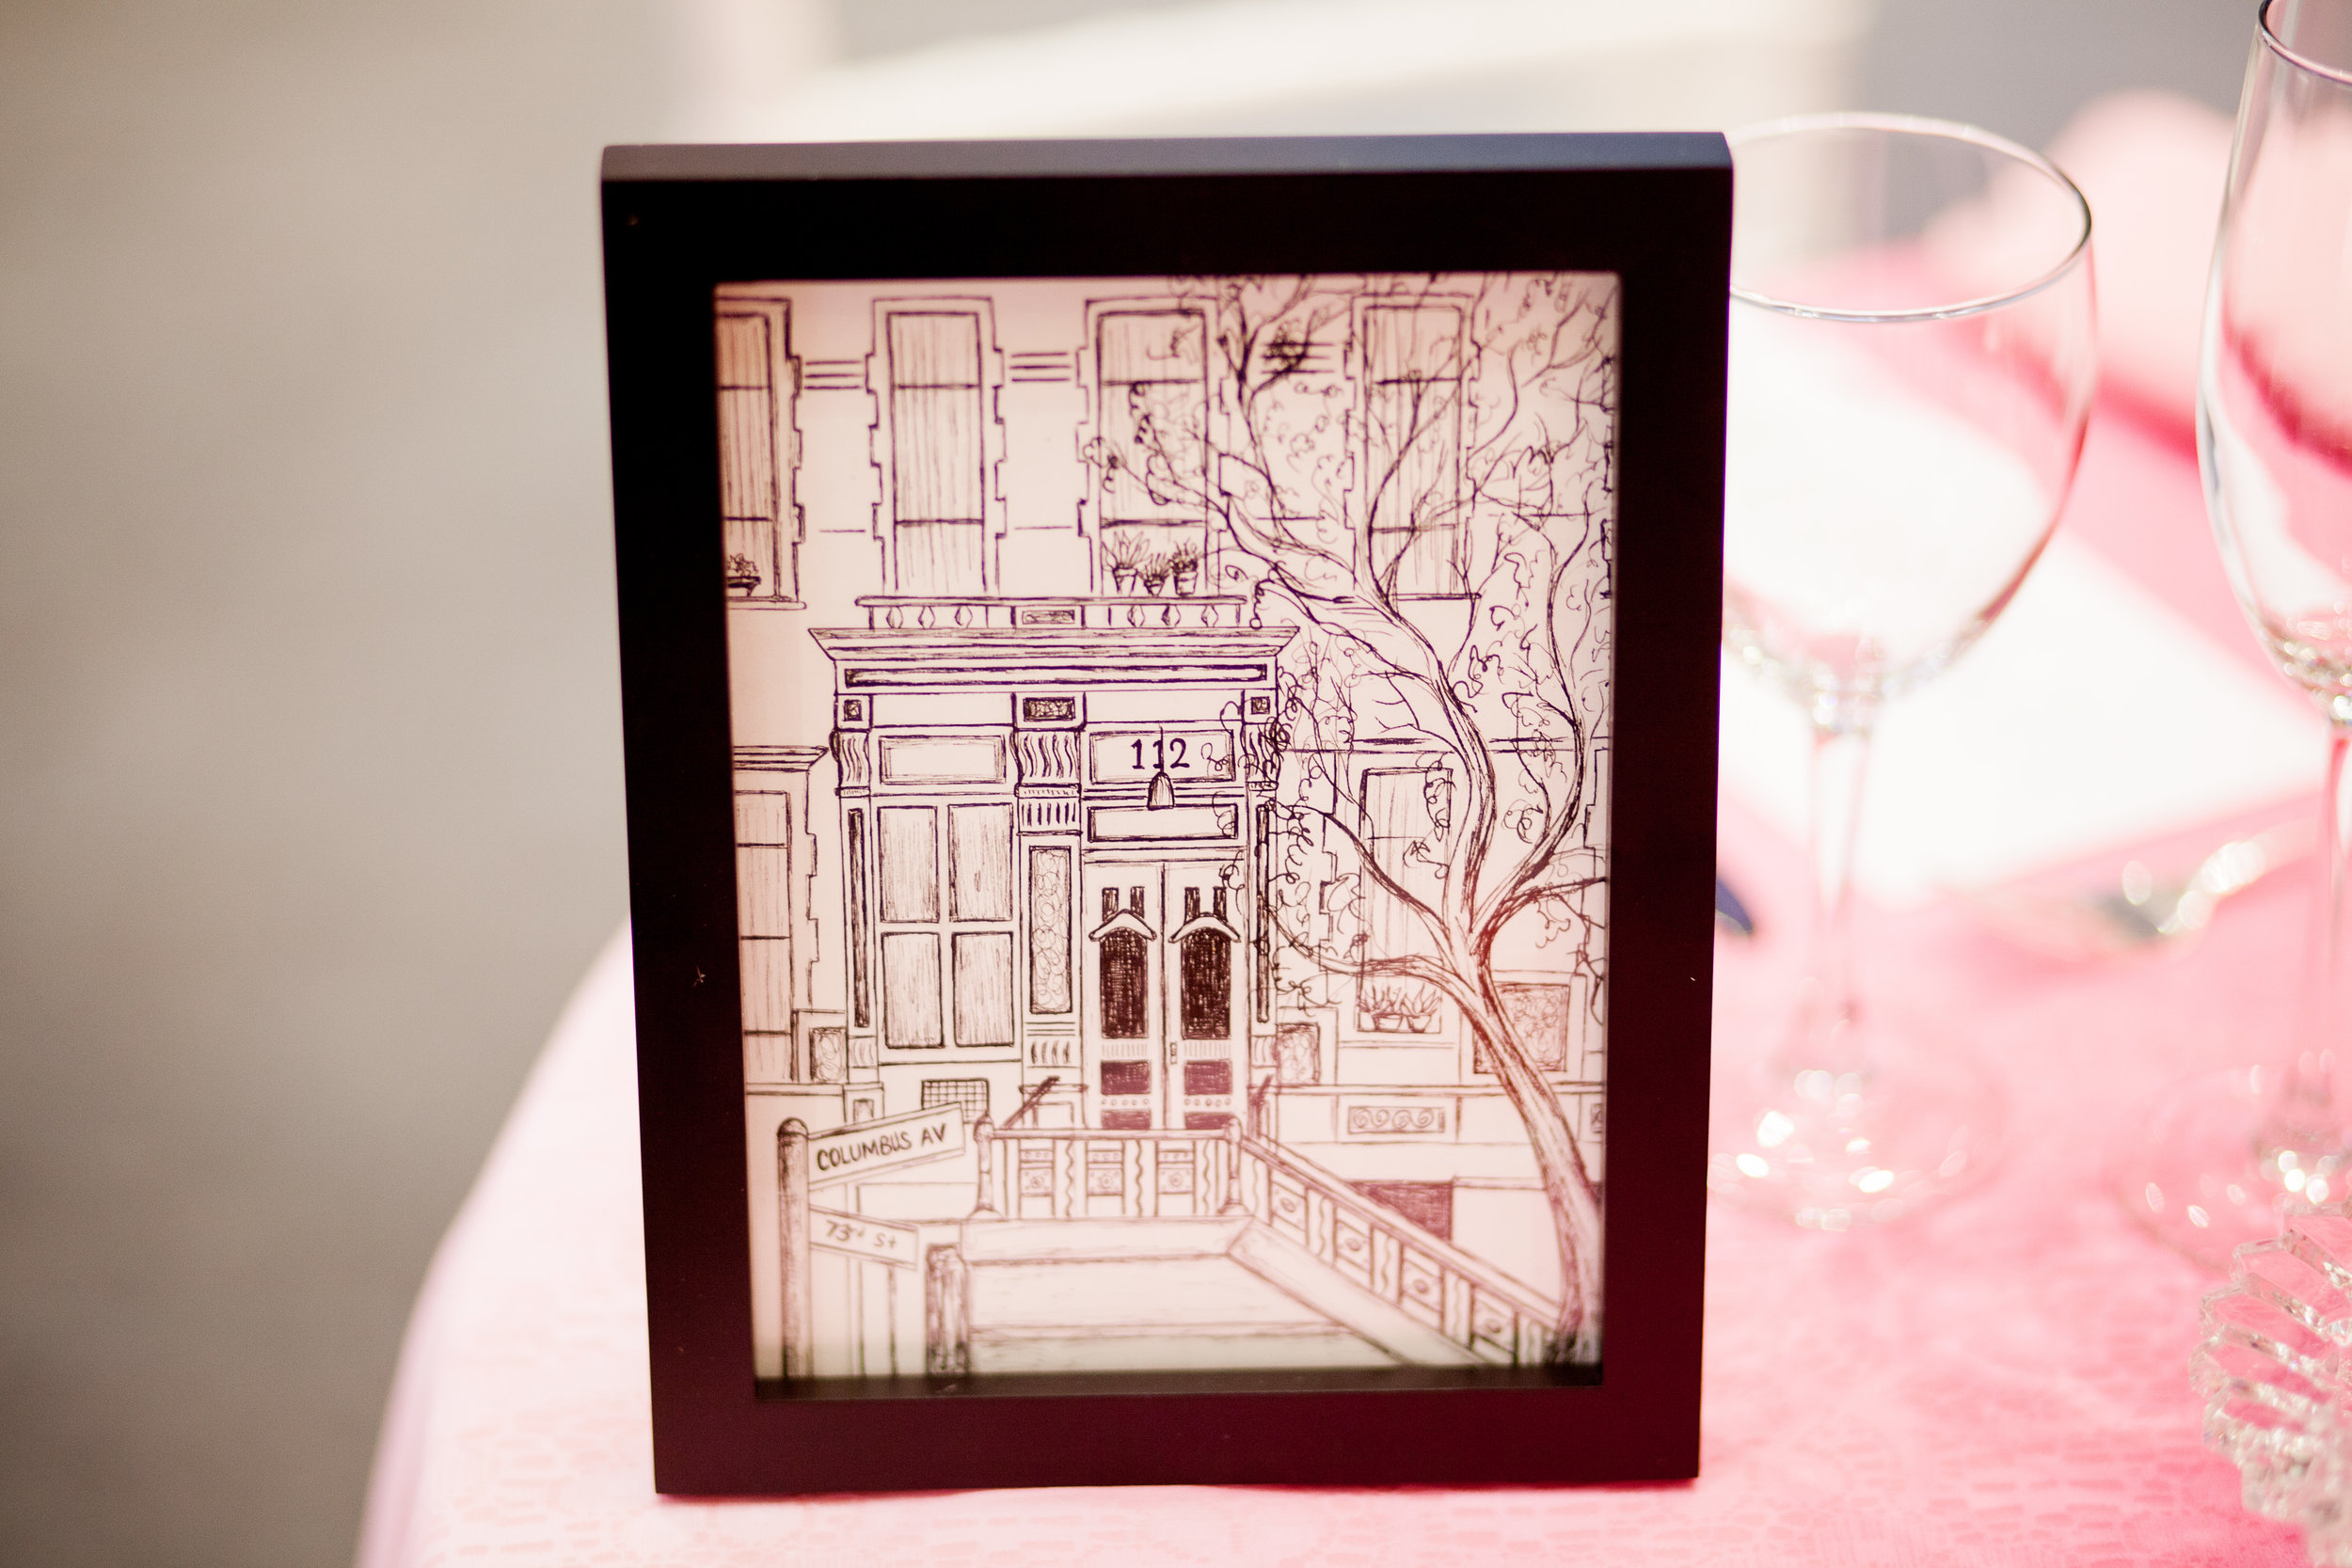 Pineapple Street Designs Stationery Illustrations for Weddings (27).jpg